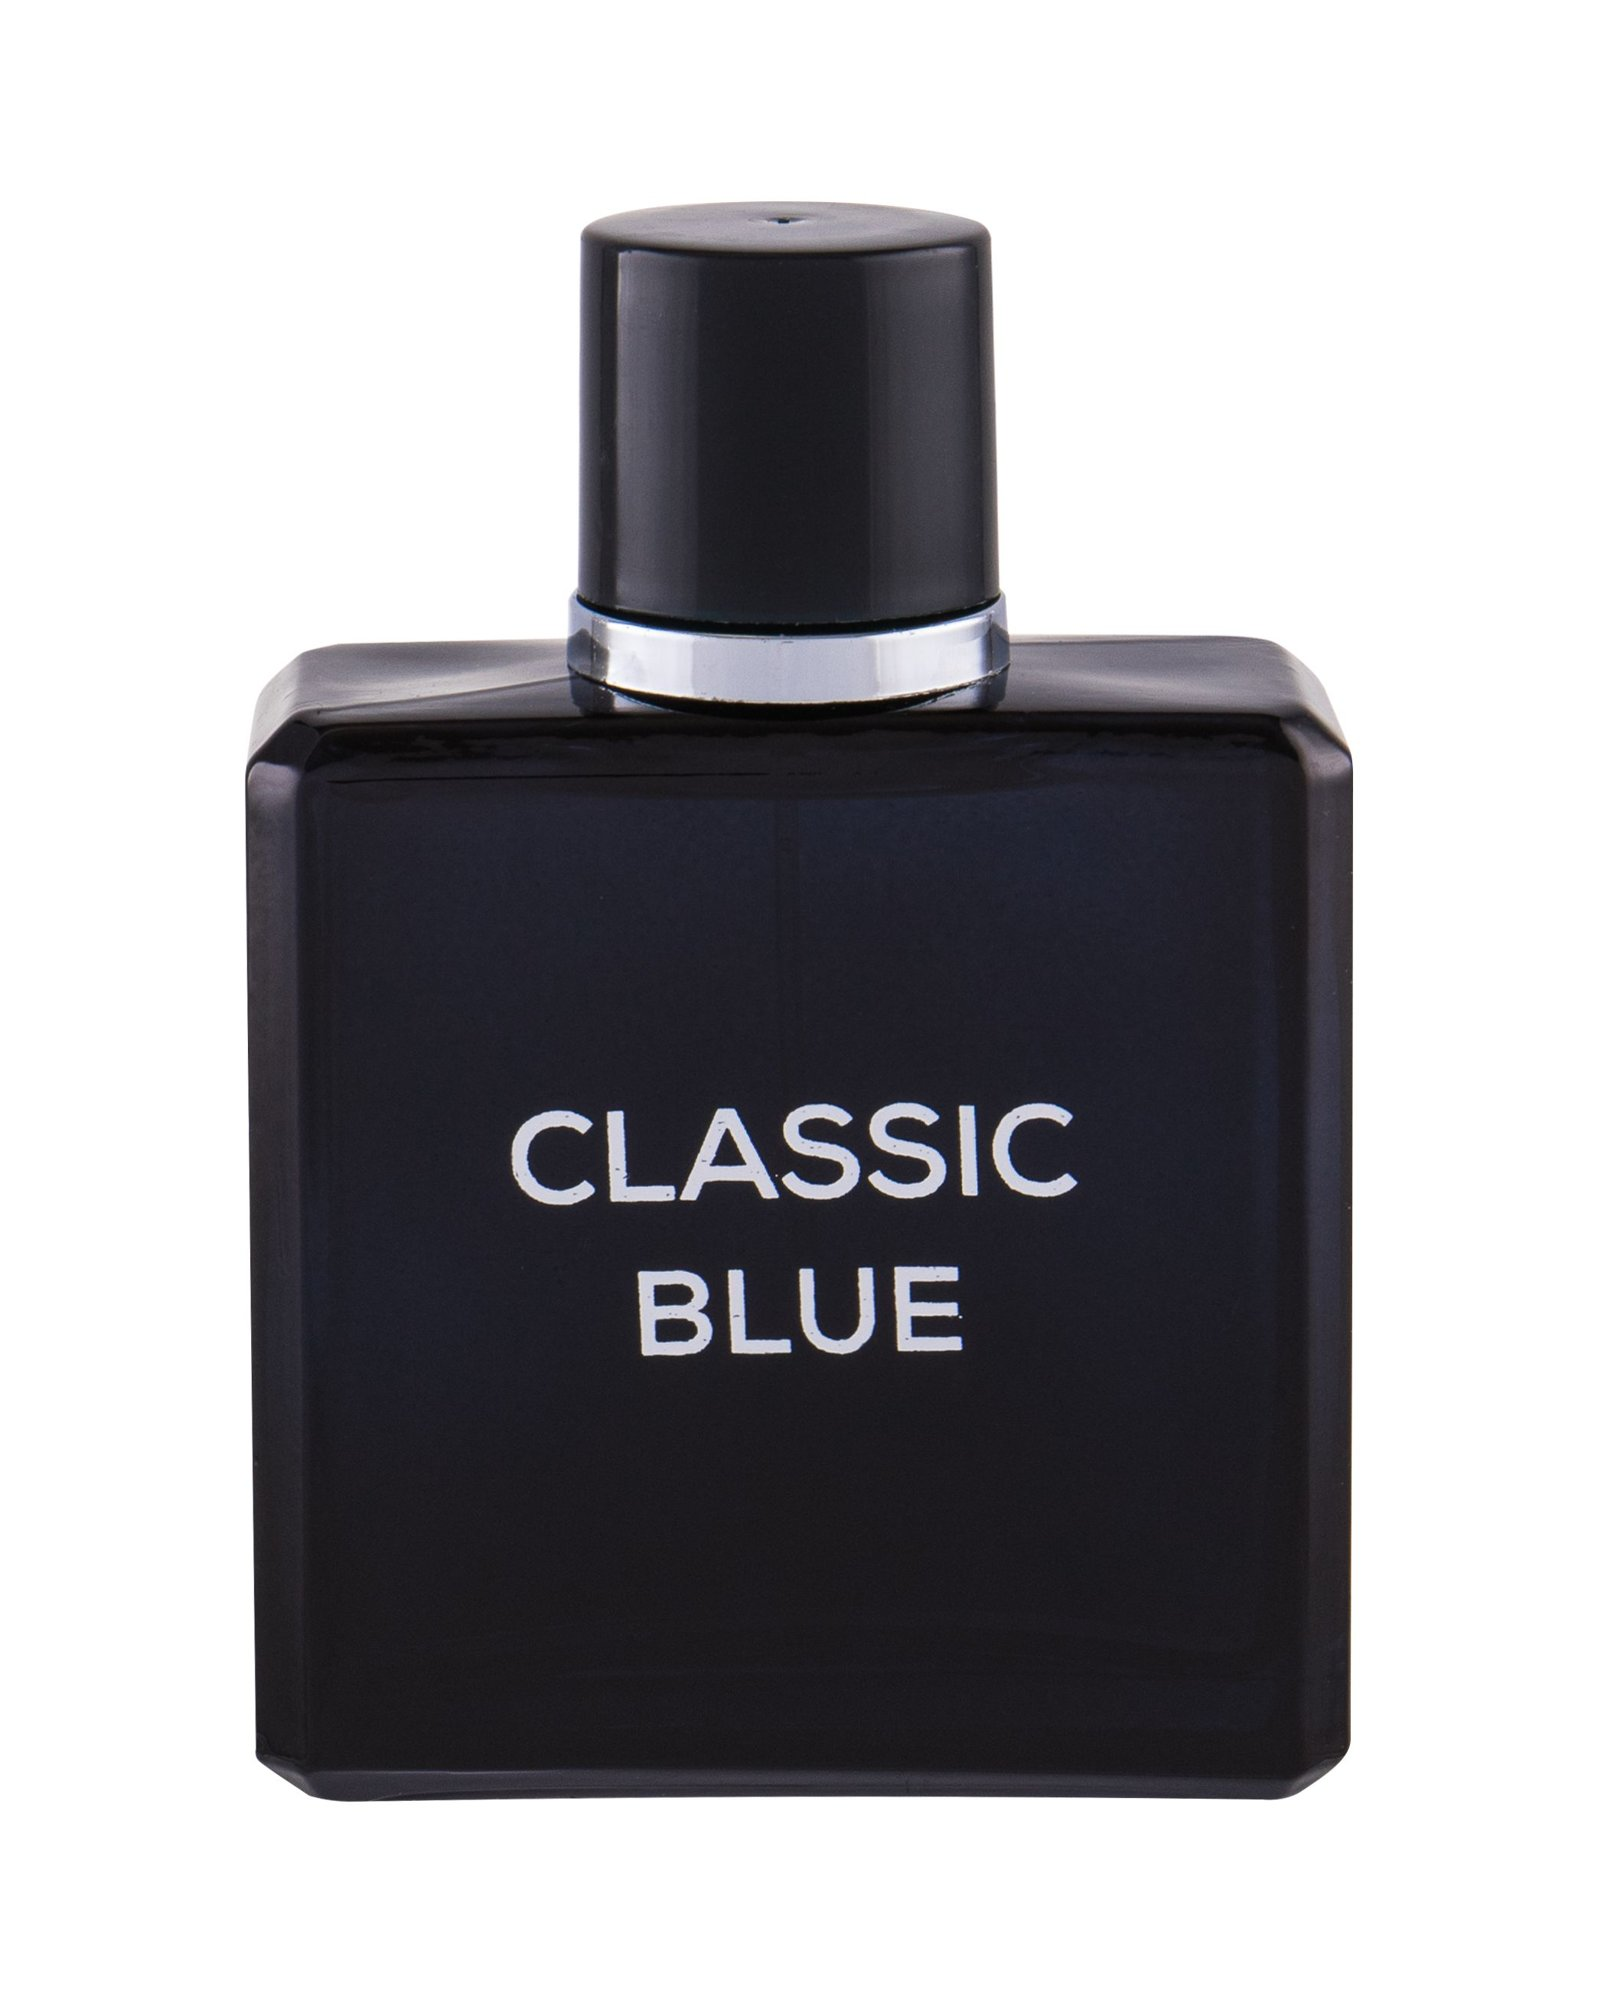 Mirage Brands Classic Blue